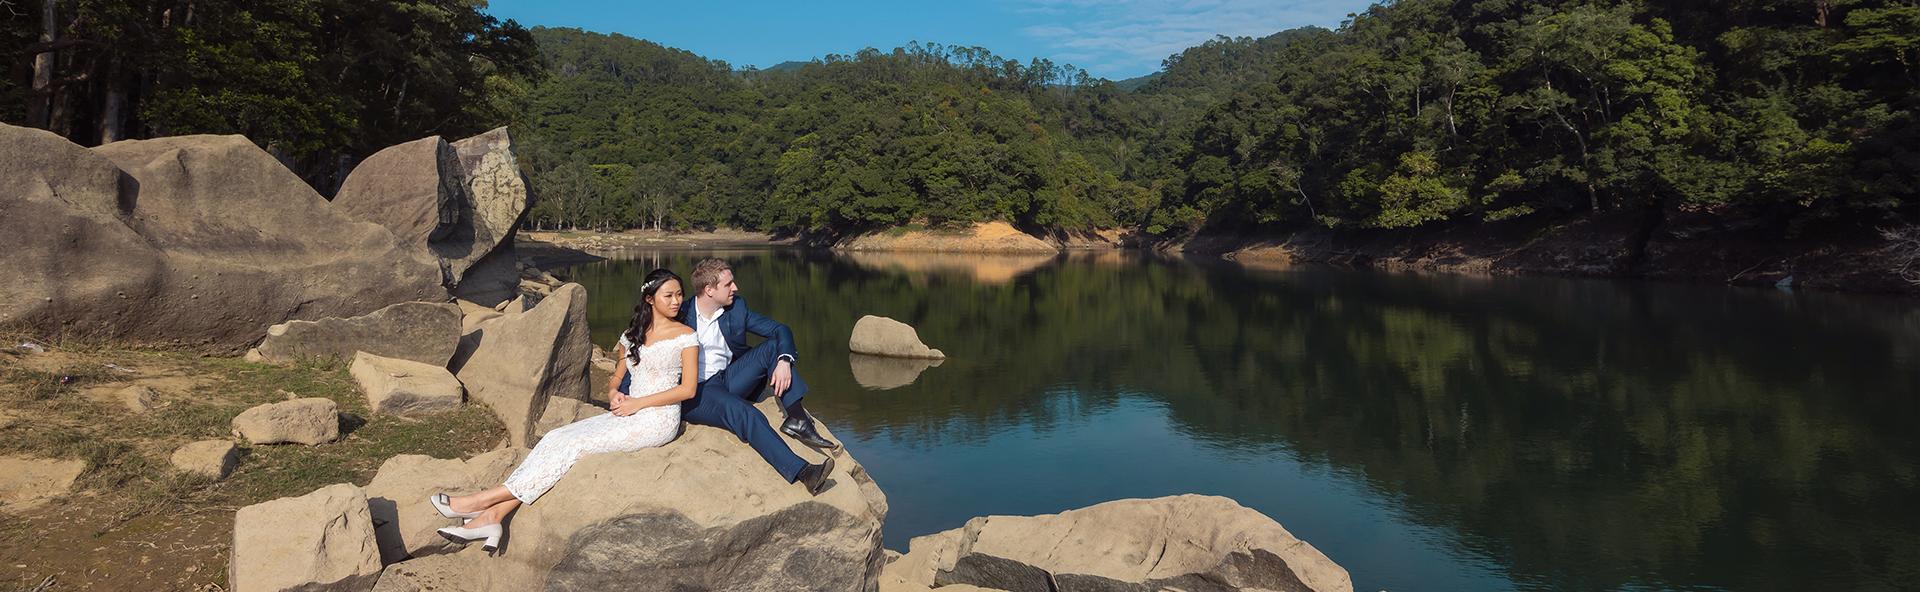 Wedding Photography - 婚紗攝影